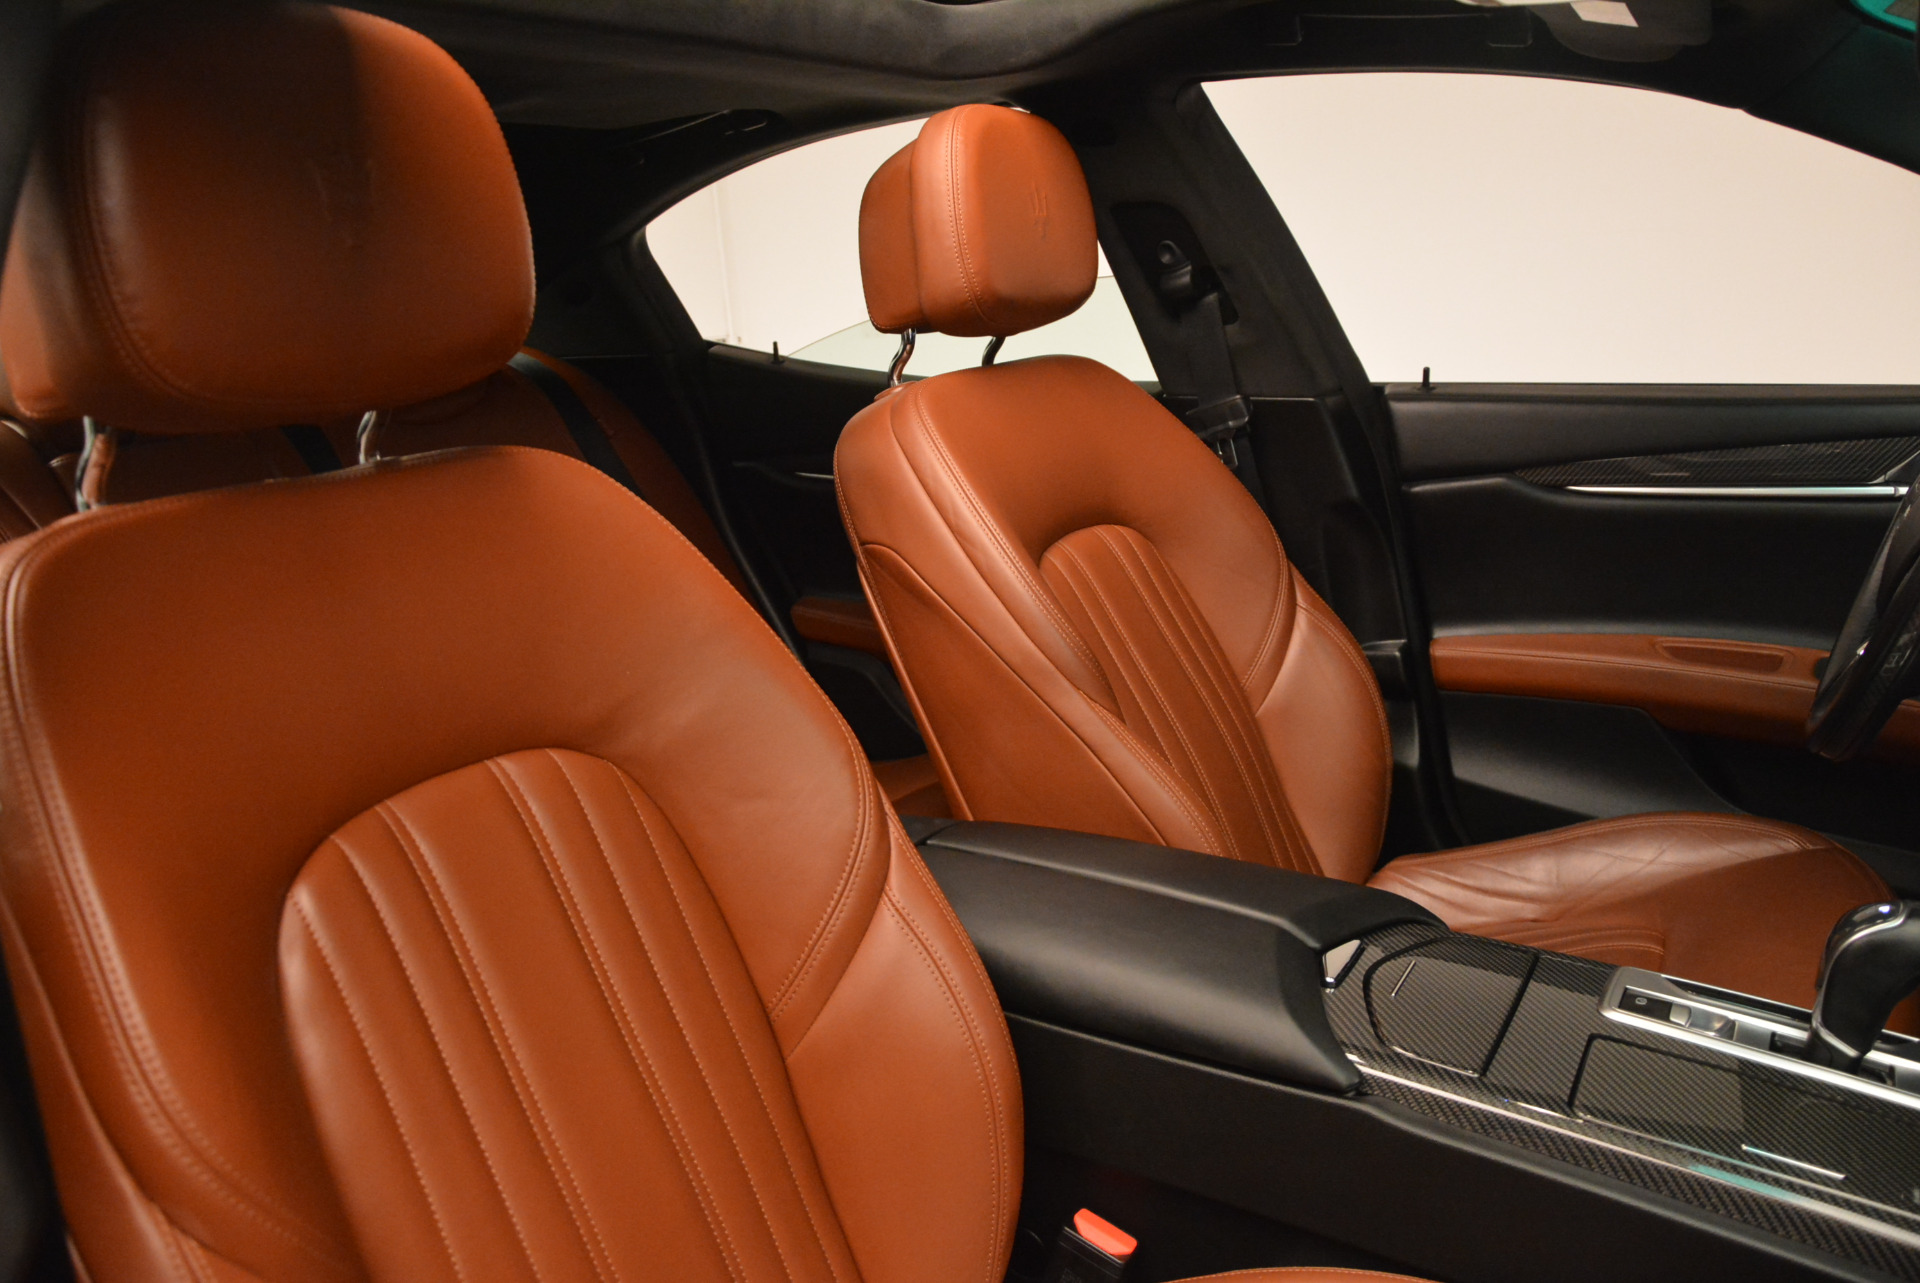 Used 2014 Maserati Ghibli S Q4 For Sale In Westport, CT 805_p22